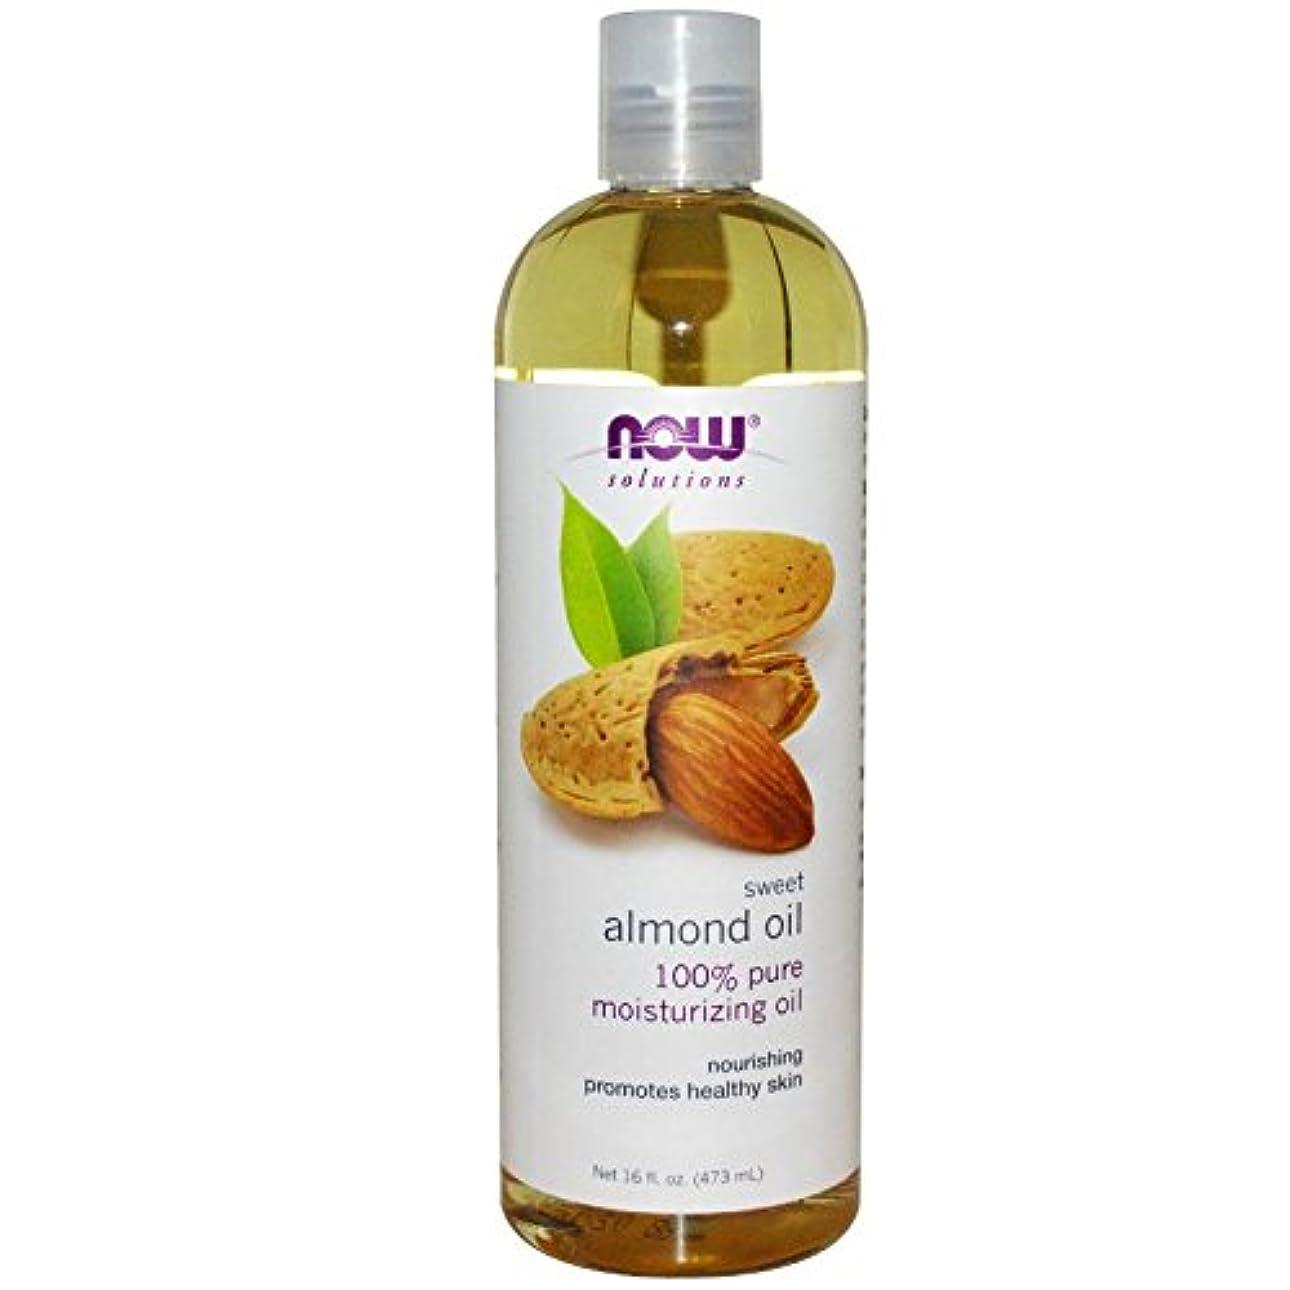 旅行代理店藤色フリル【国内発送】 Now Solutions Sweet Almond Oil 16 oz. (473ml) [並行輸入品]